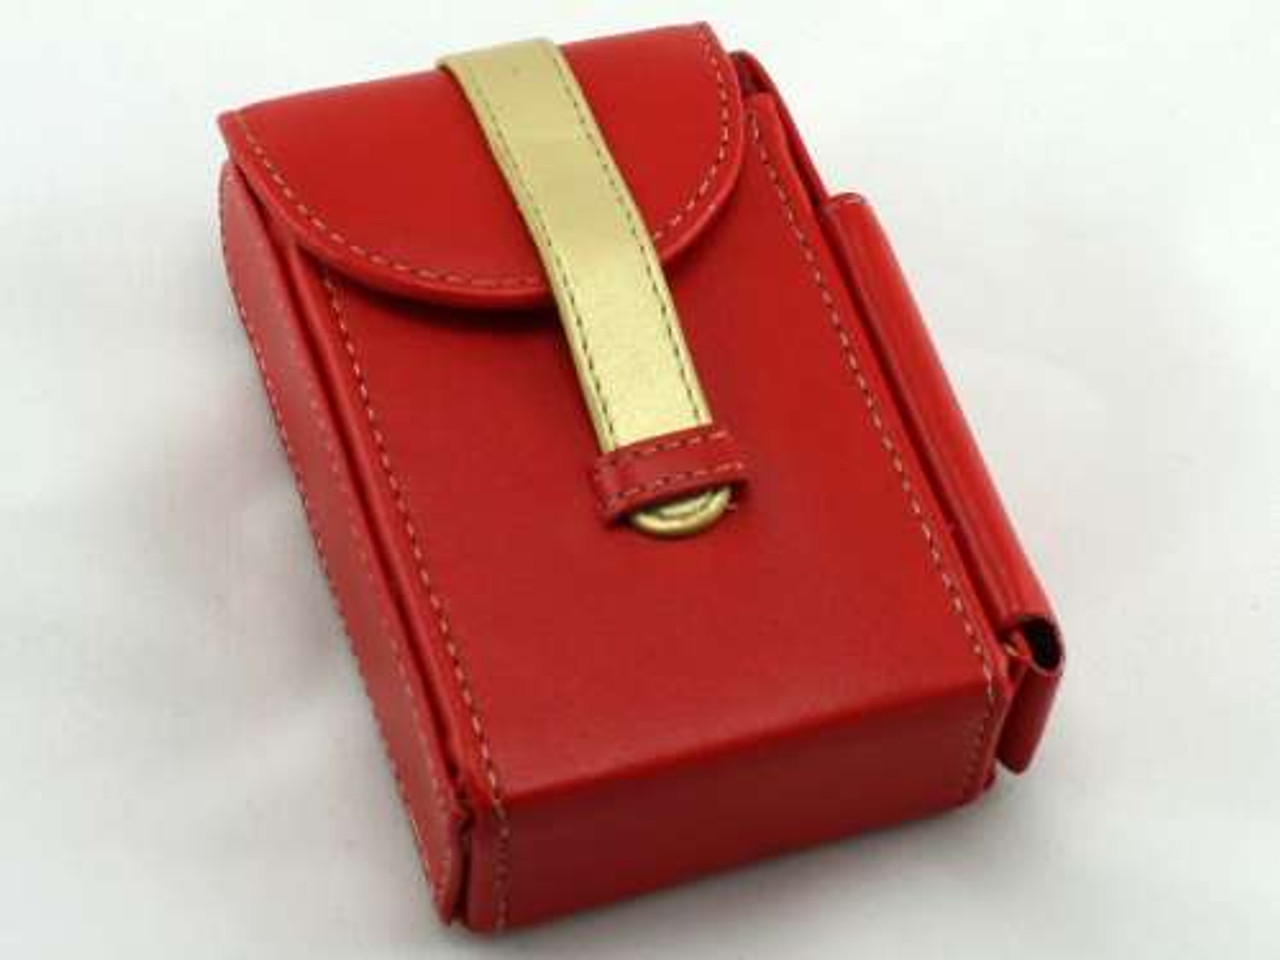 Red Leather Cigarette Pack Holder